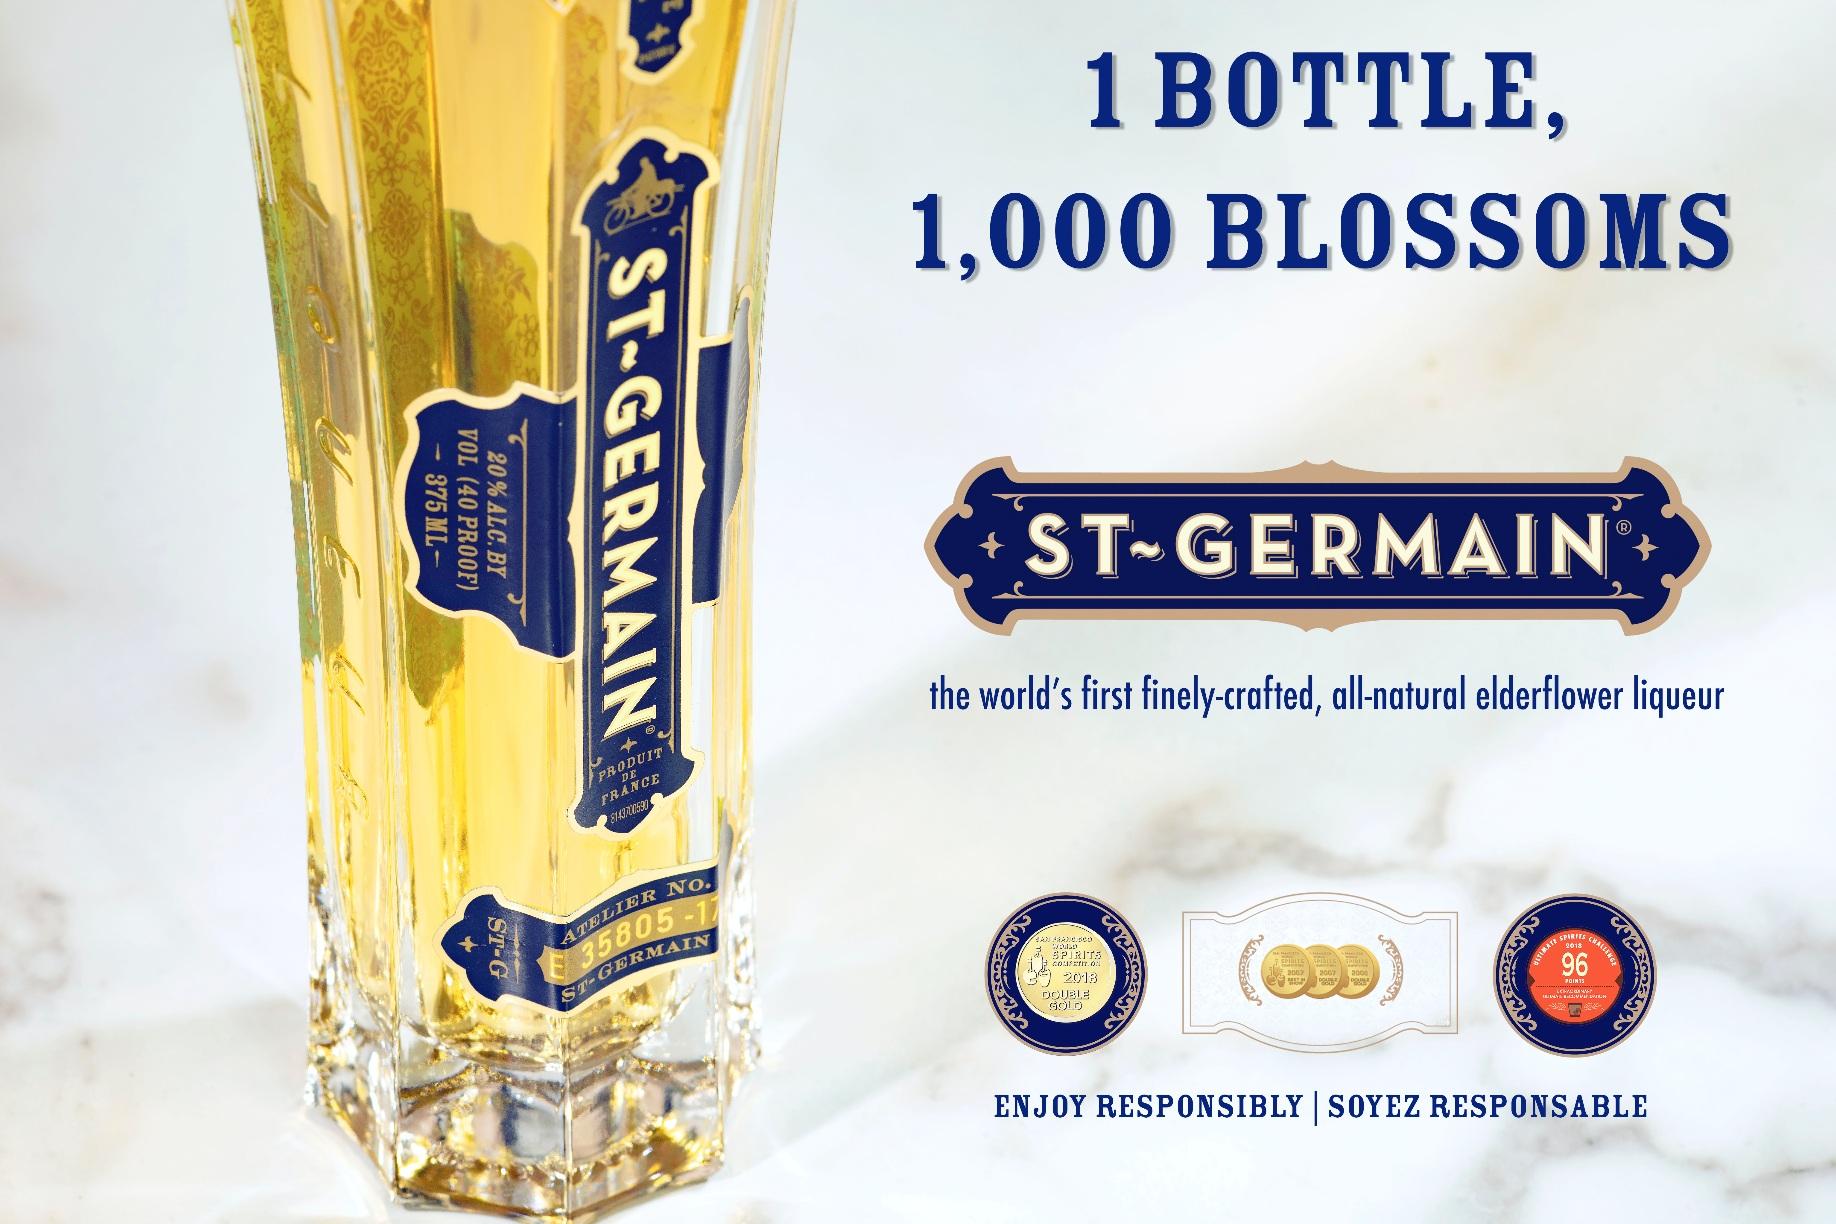 St-Germain elderflower liqueur - 1 bottle, 1,000 blossoms.